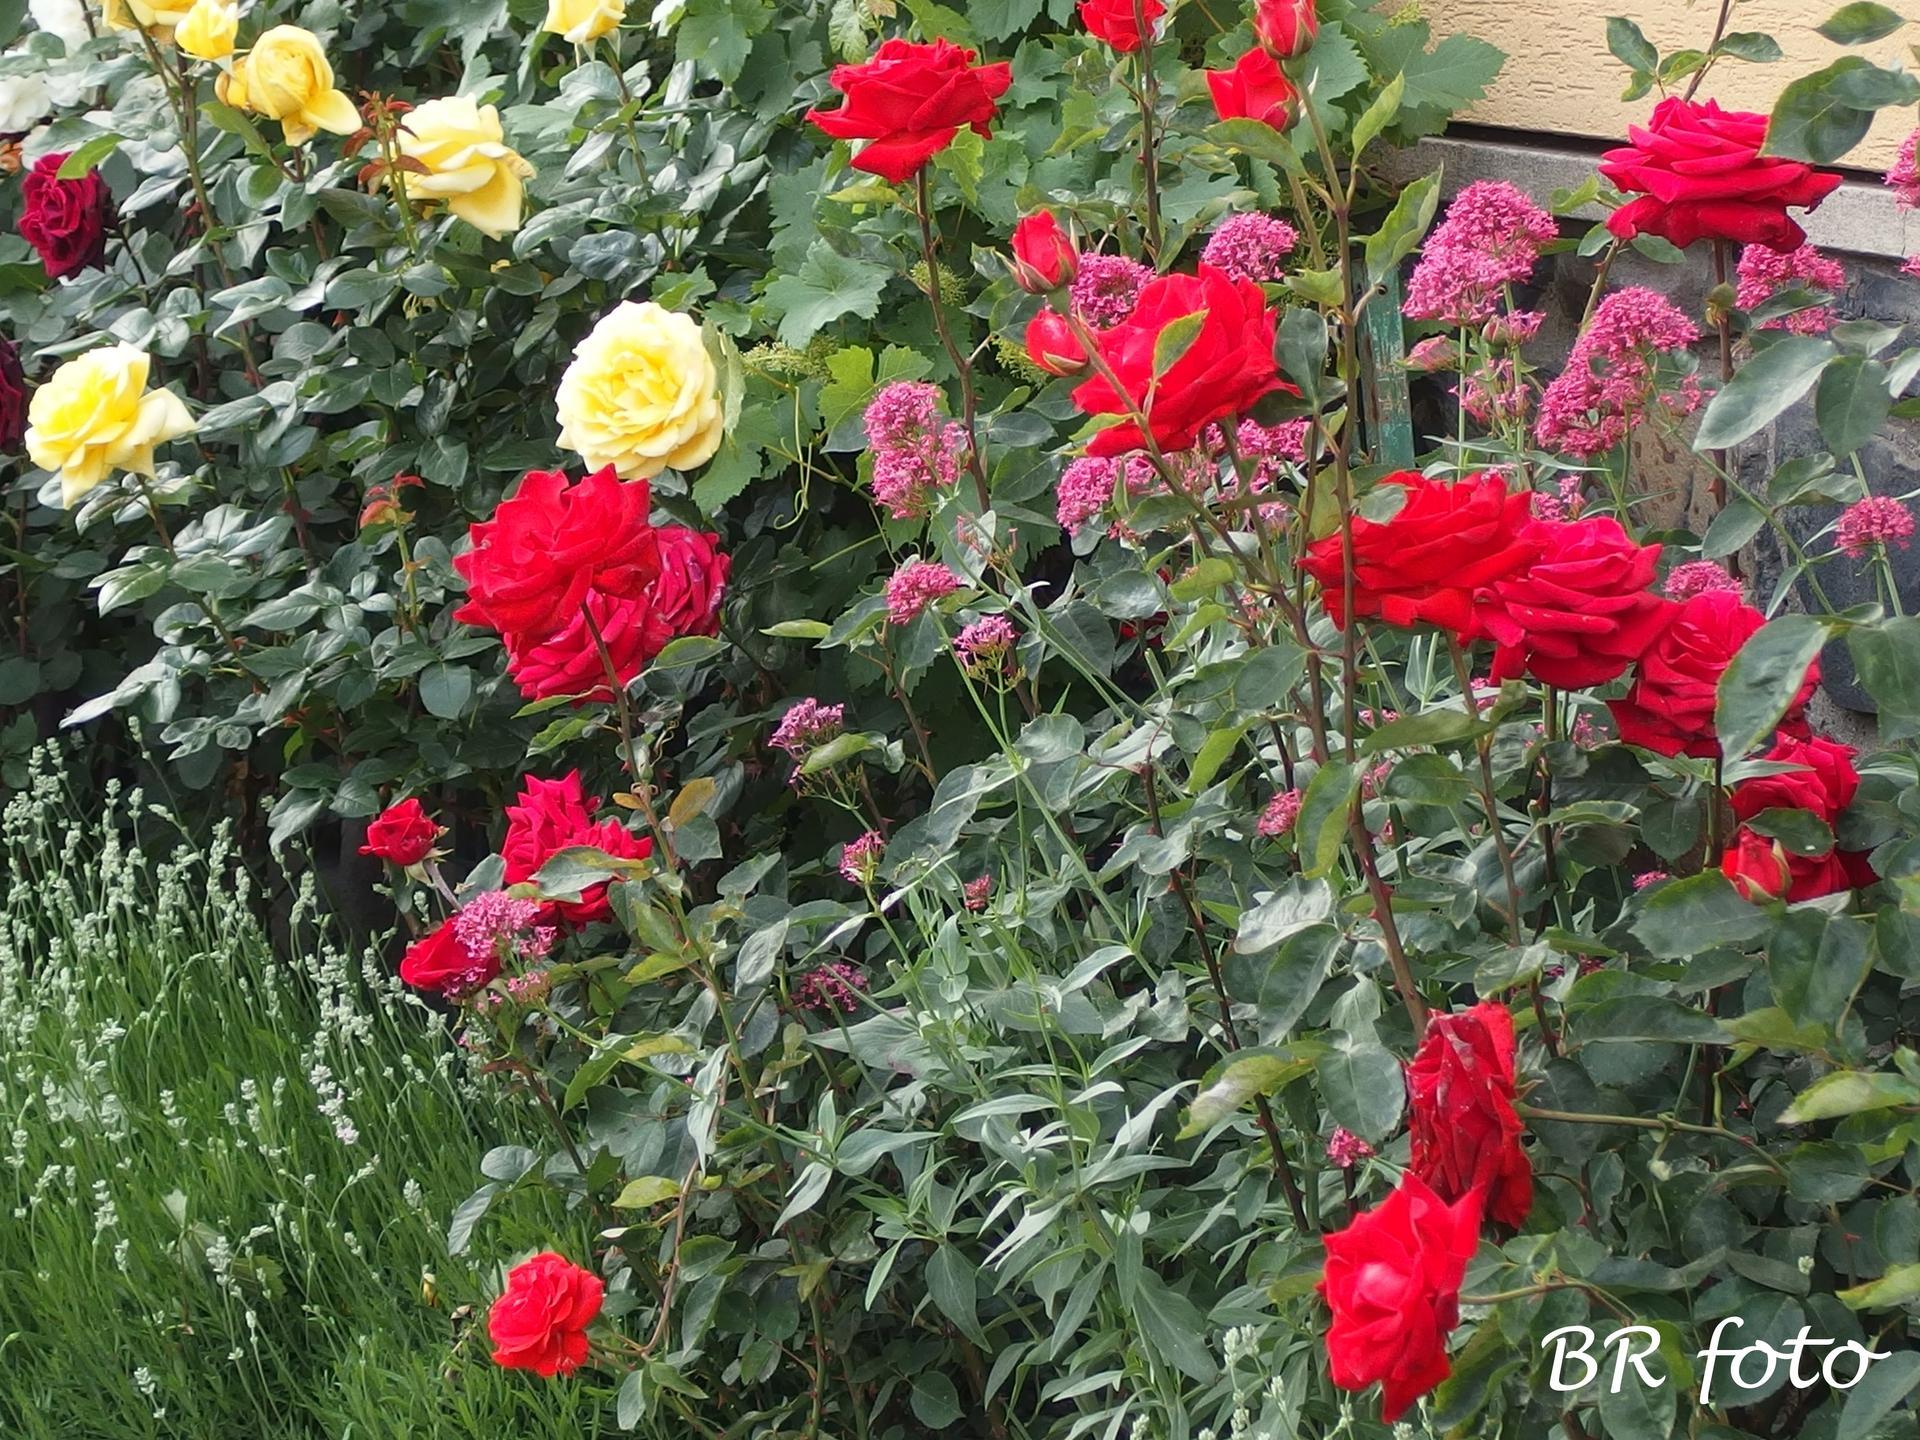 Zahrada v červnu - vše roste a kvete jako o život.... - čas růží